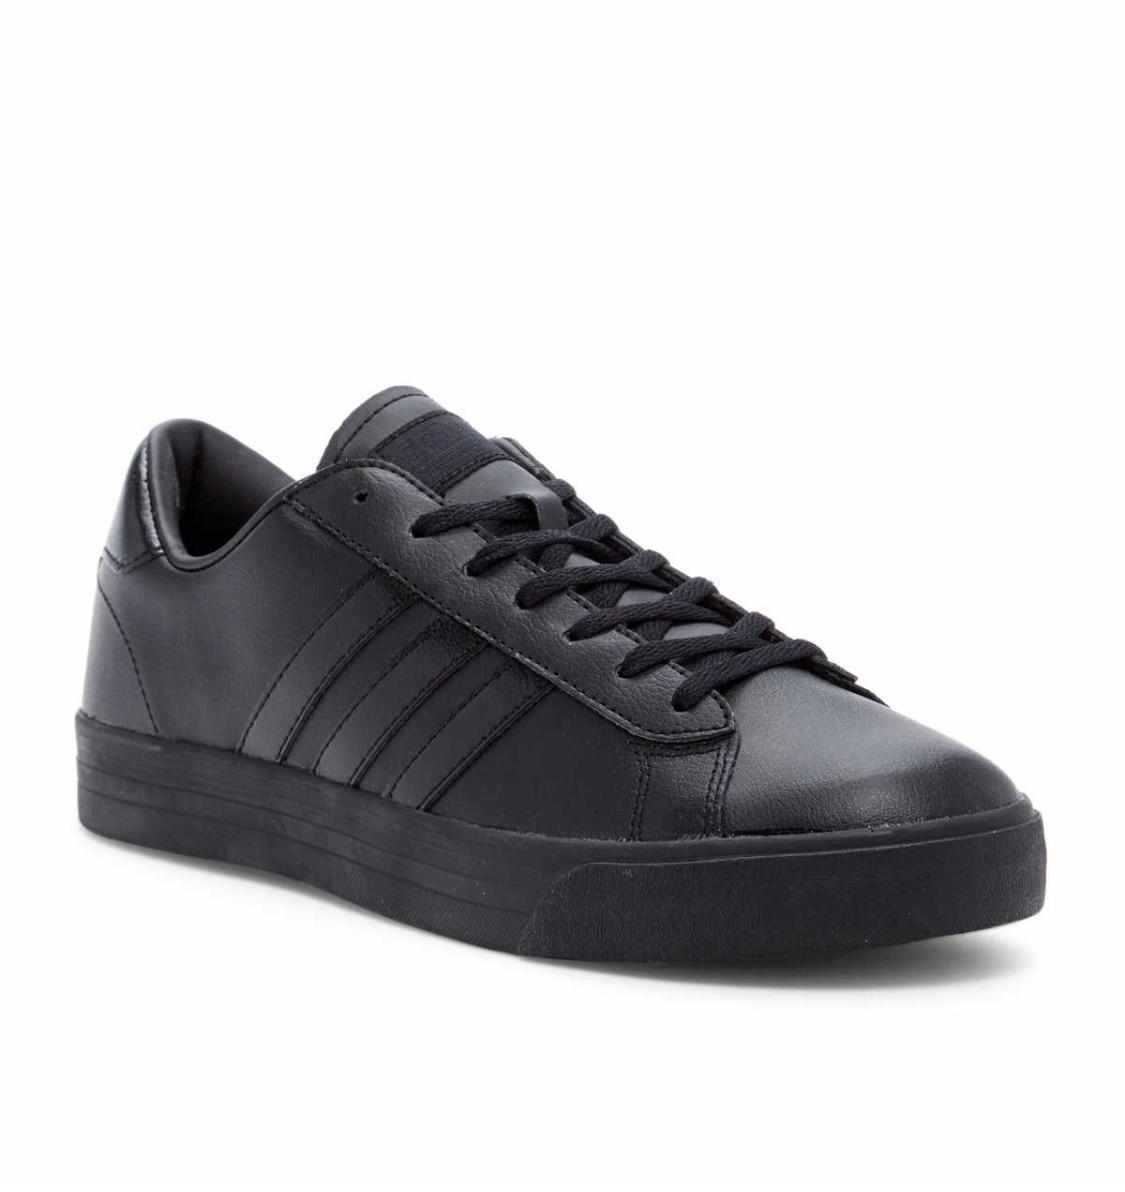 adidas cloudfoam super daily black